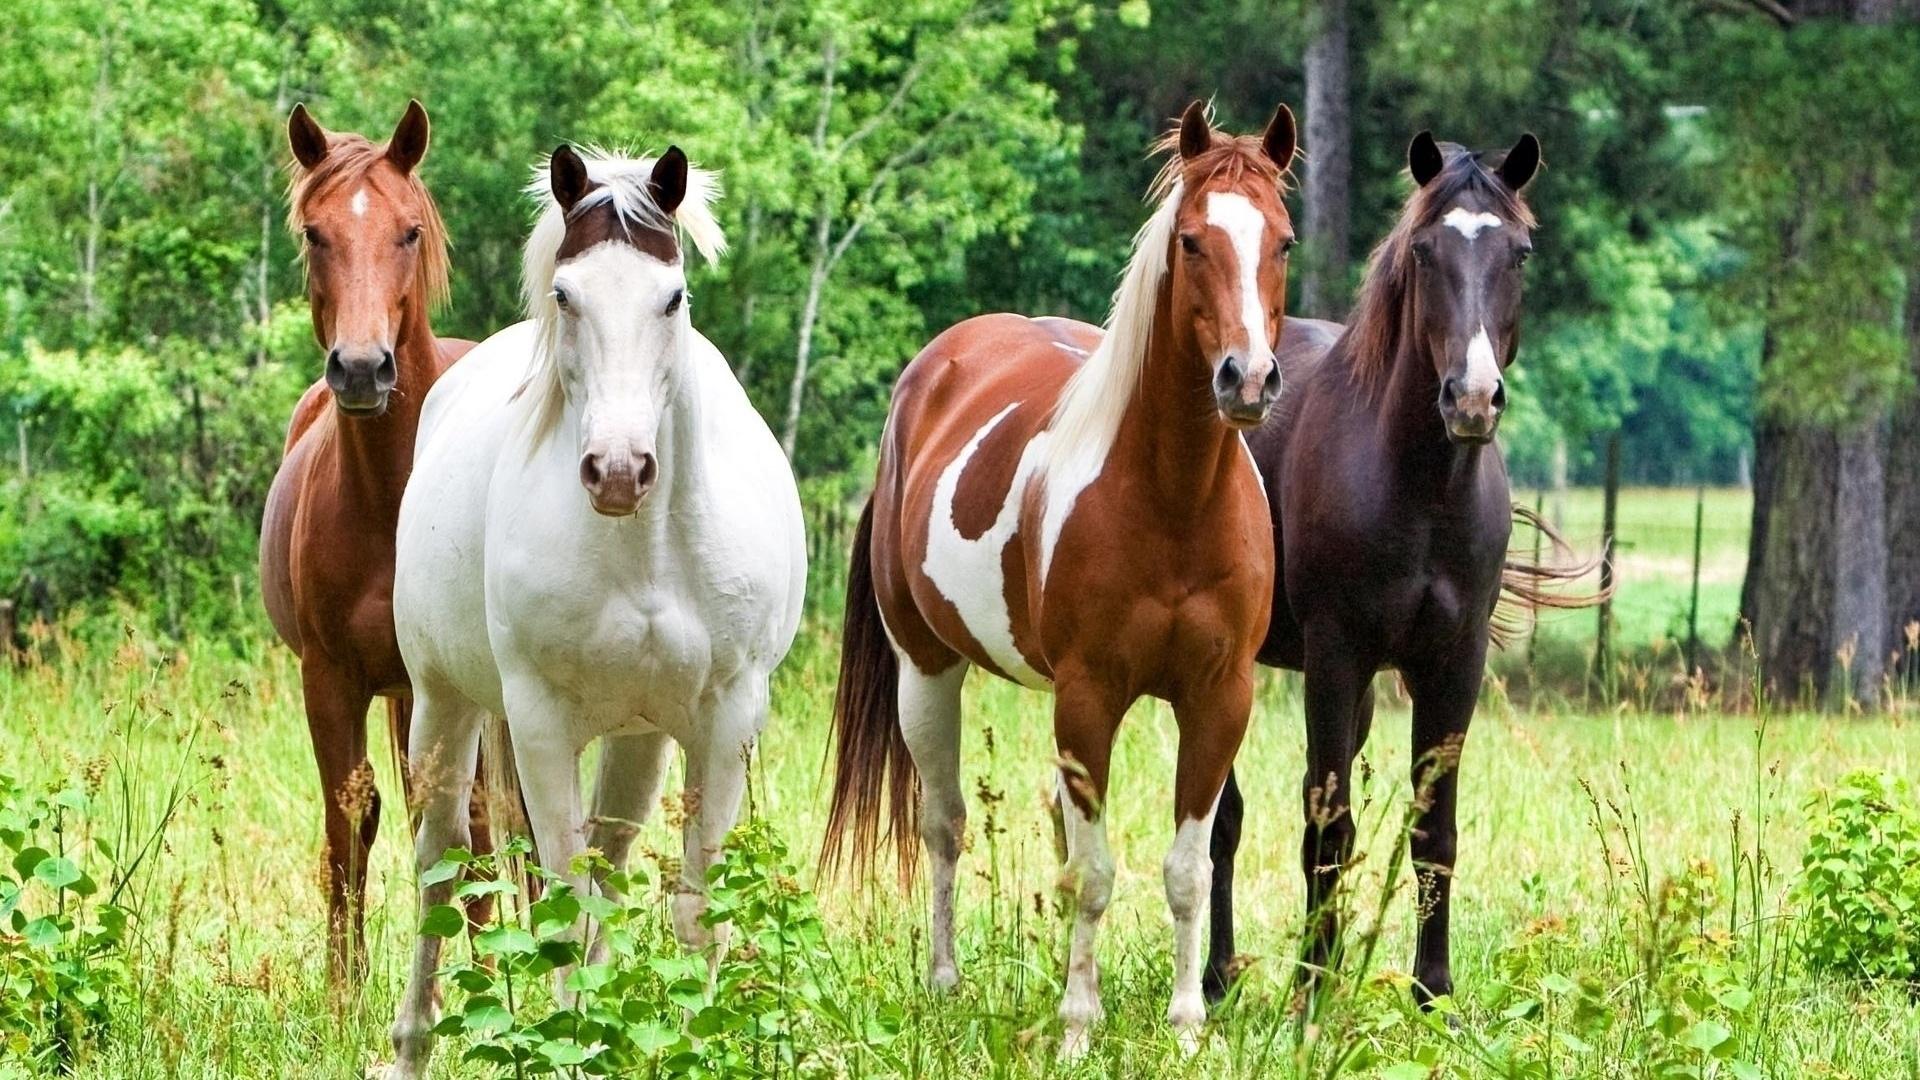 cheval wallpaper hd 1 - photo #12